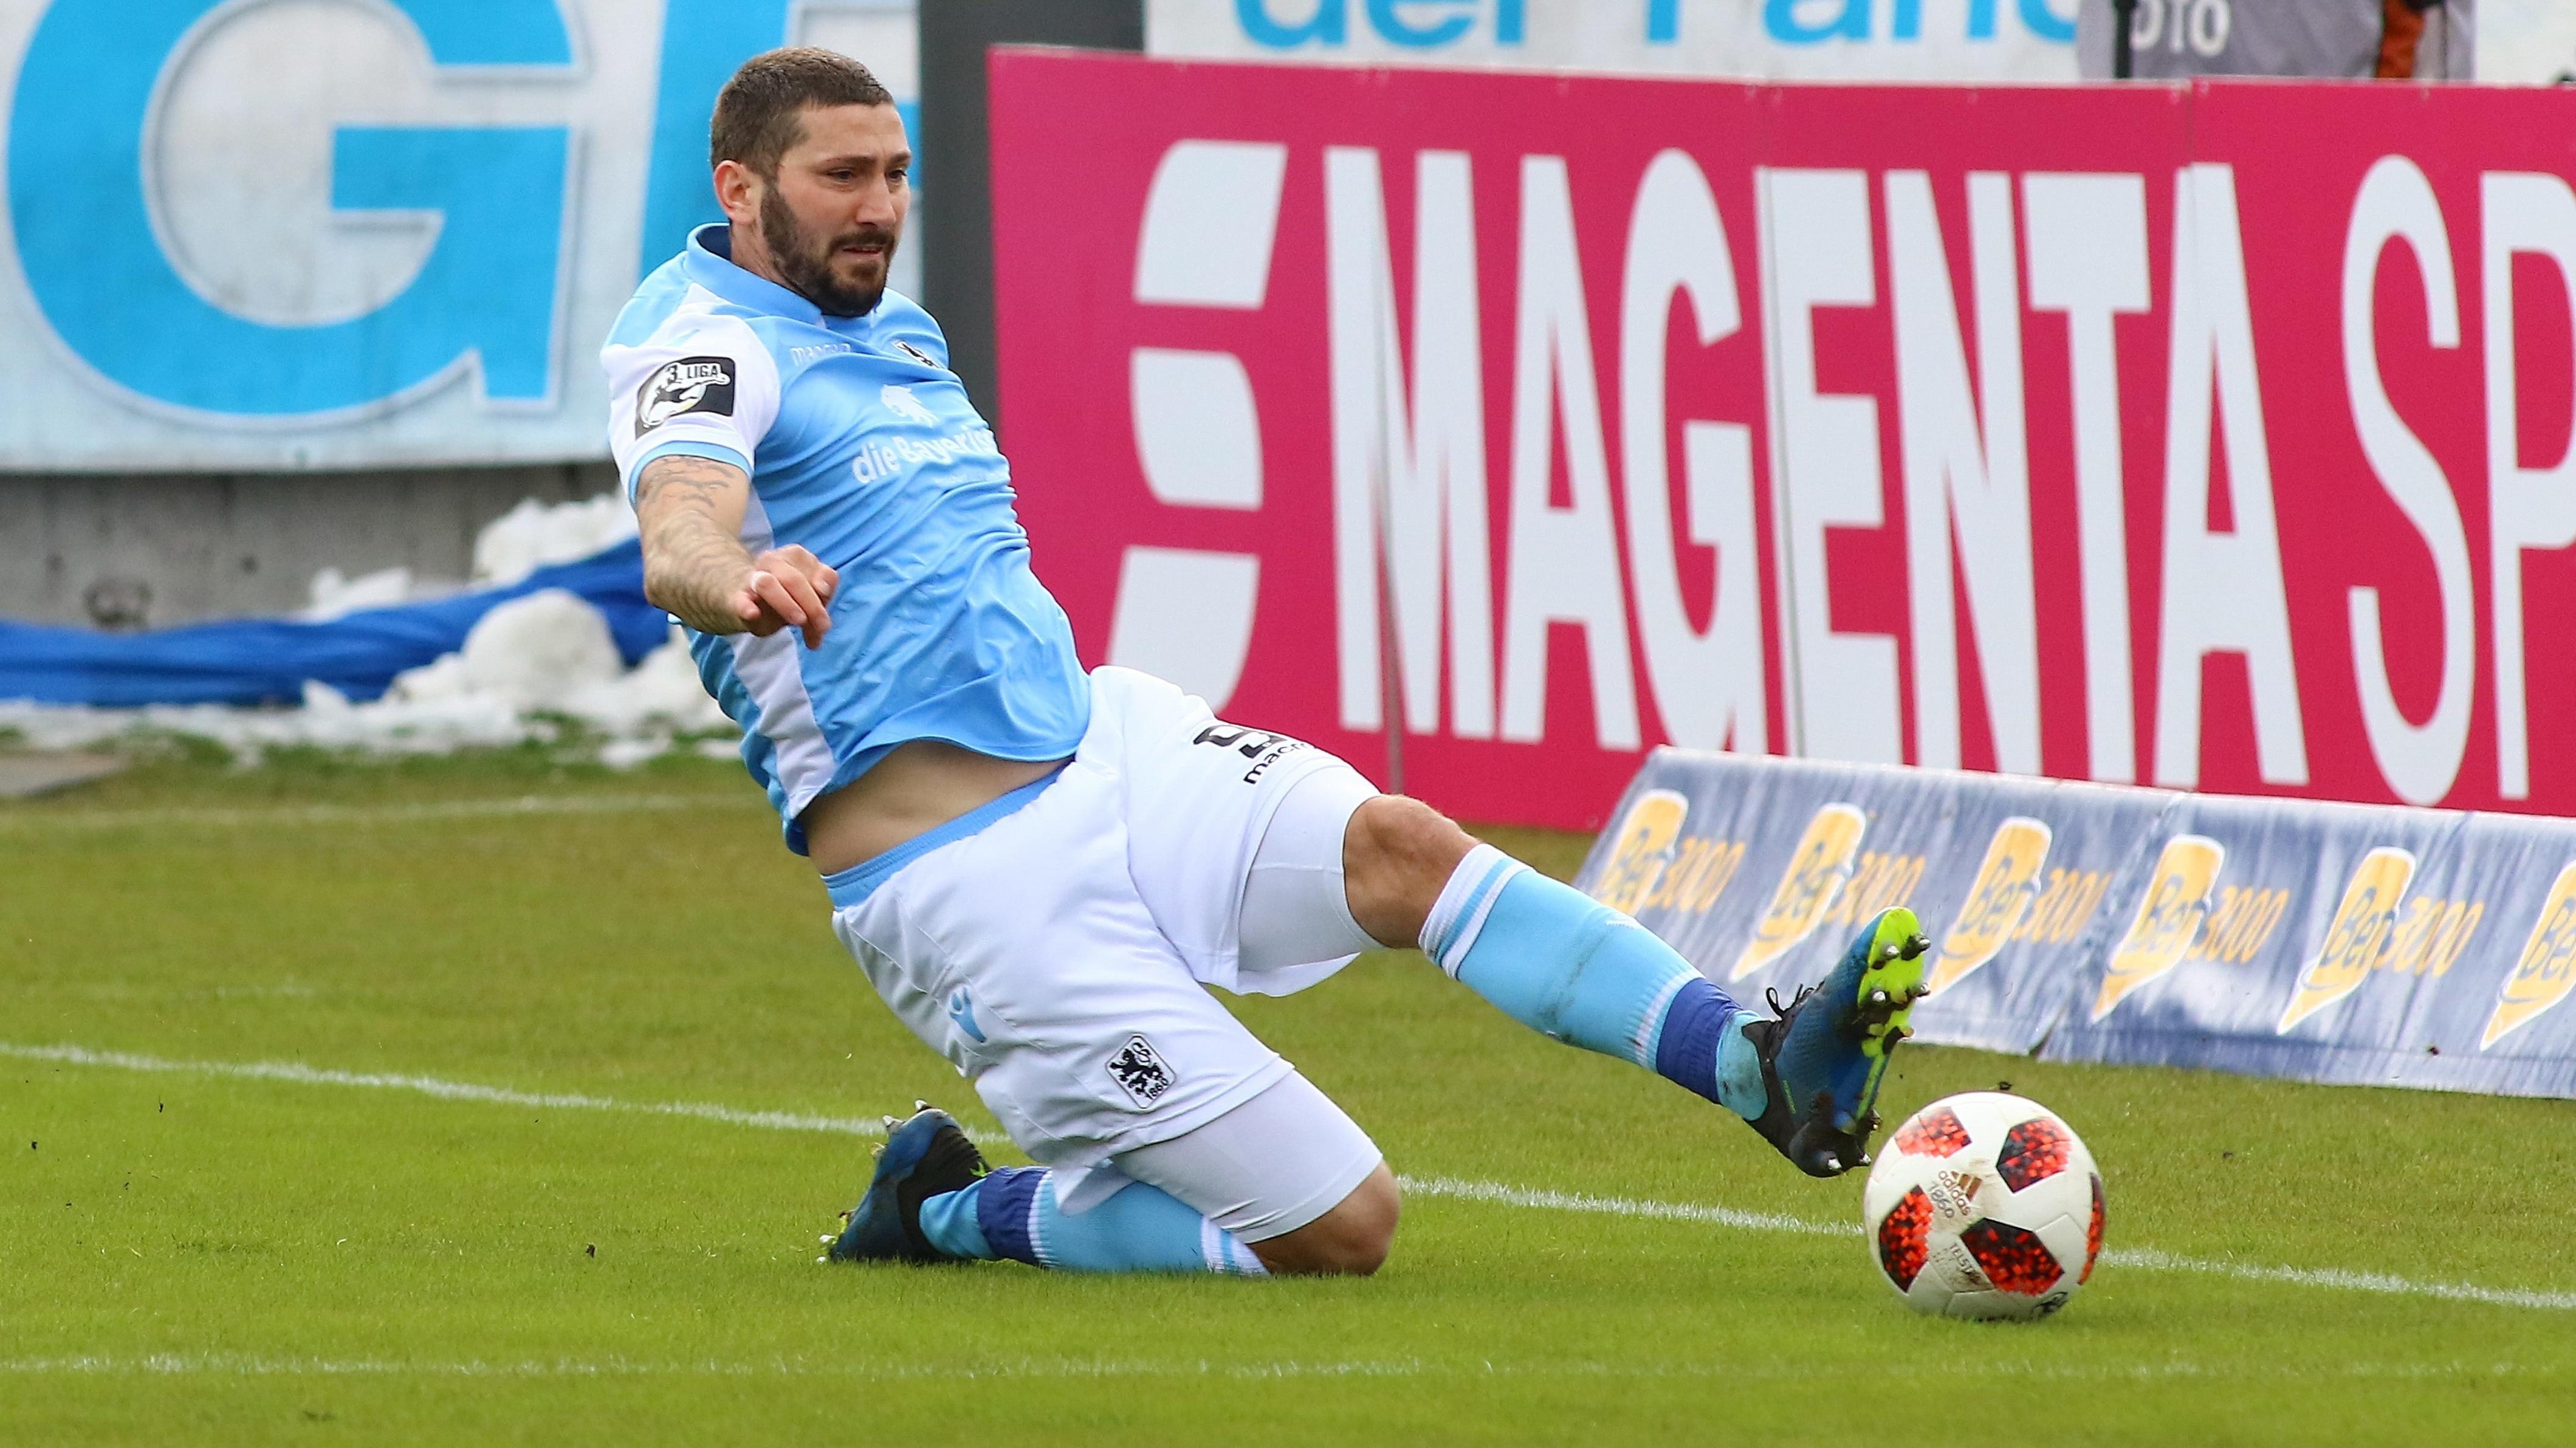 Sascha Mölders vom TSV 1860 München